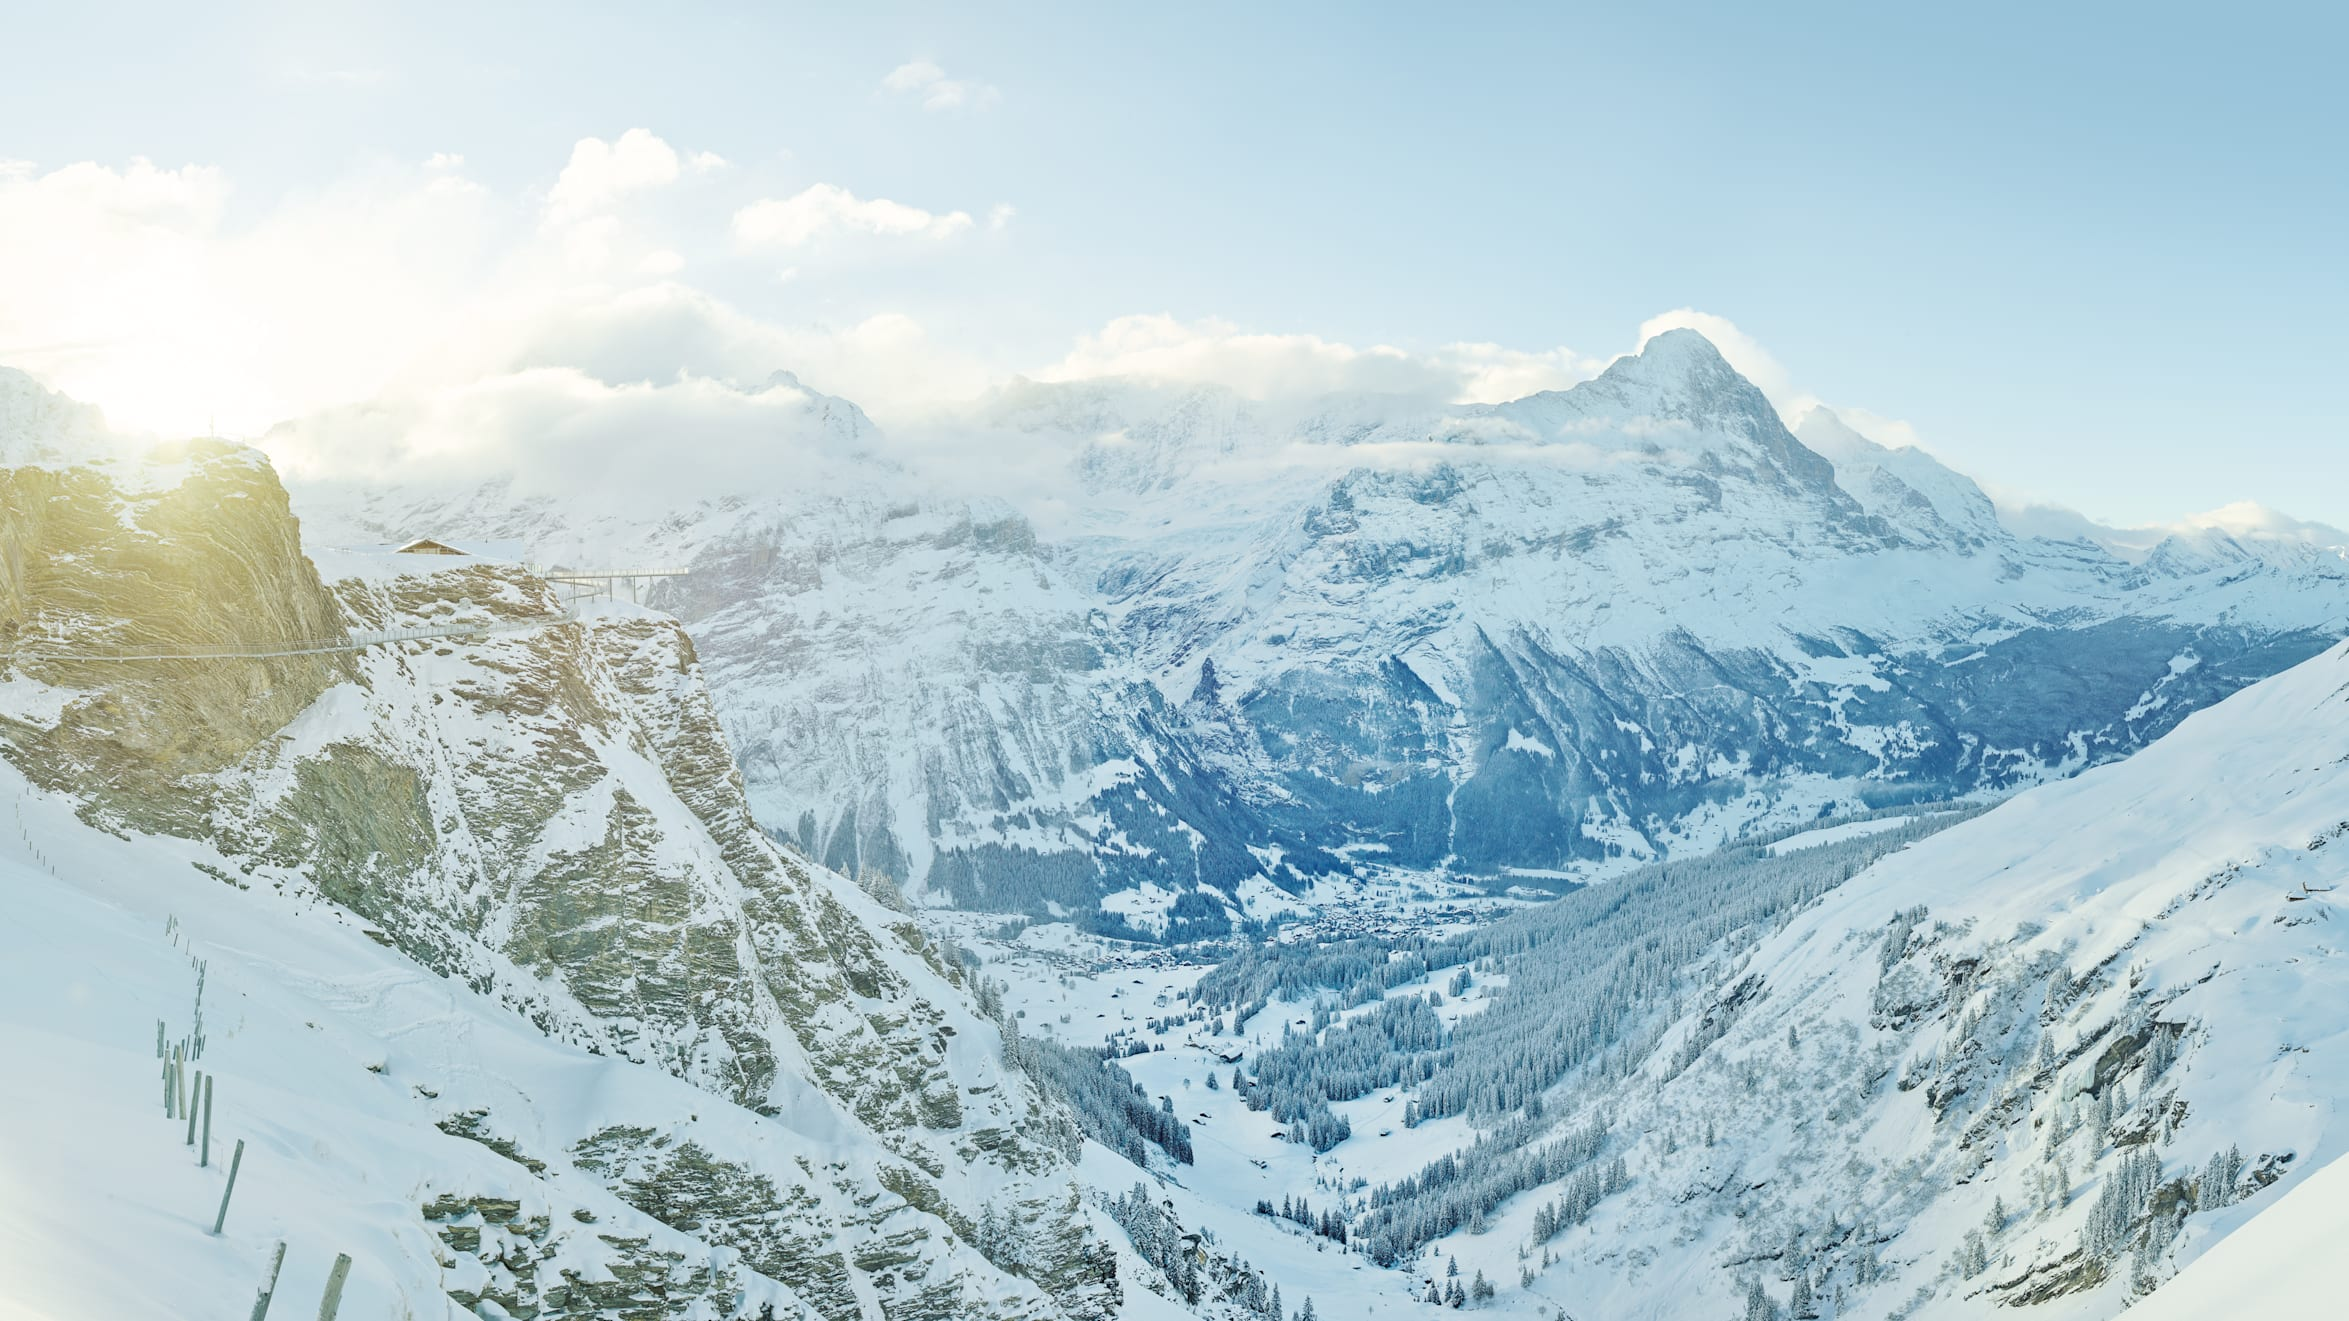 Grindelwald First Cliff Walk winter panorama